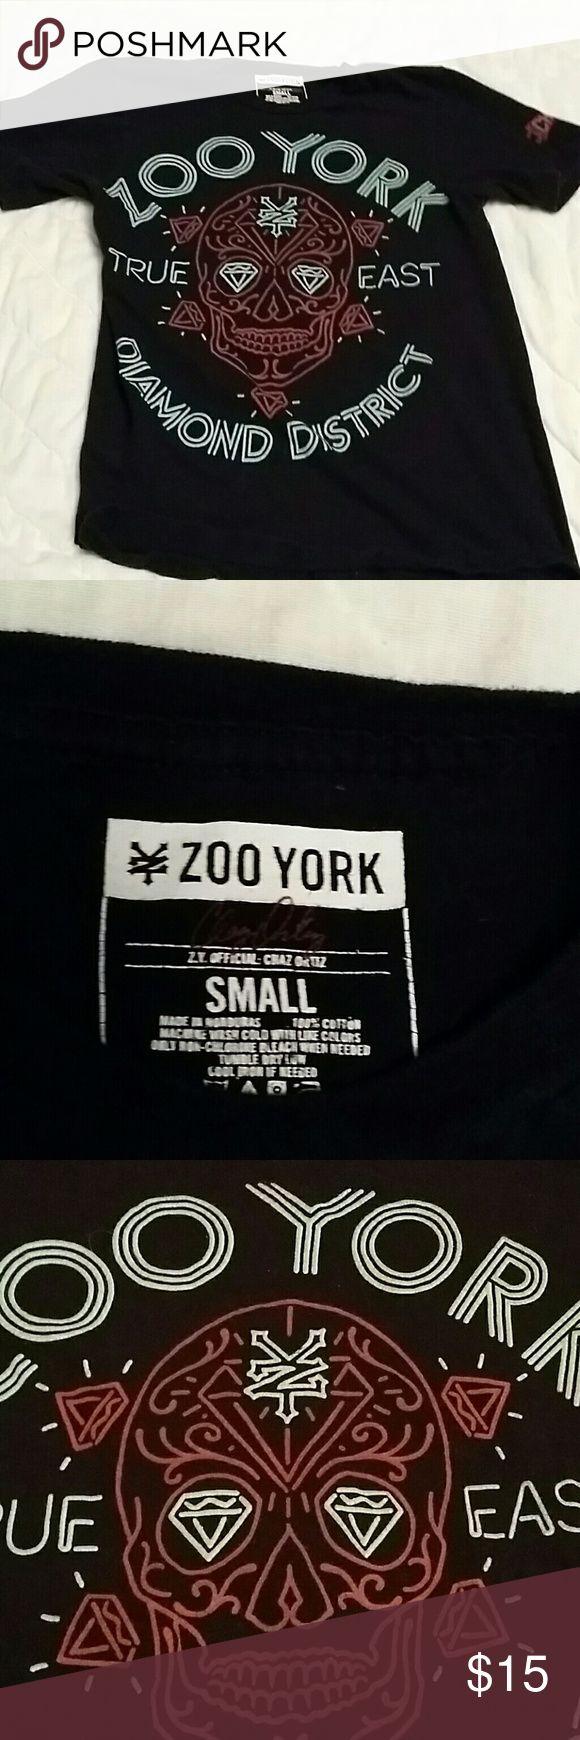 Black zoo York diamond district skull tshirt Black zoo York diamond district skull tshirt Zoo York Shirts Tees - Short Sleeve